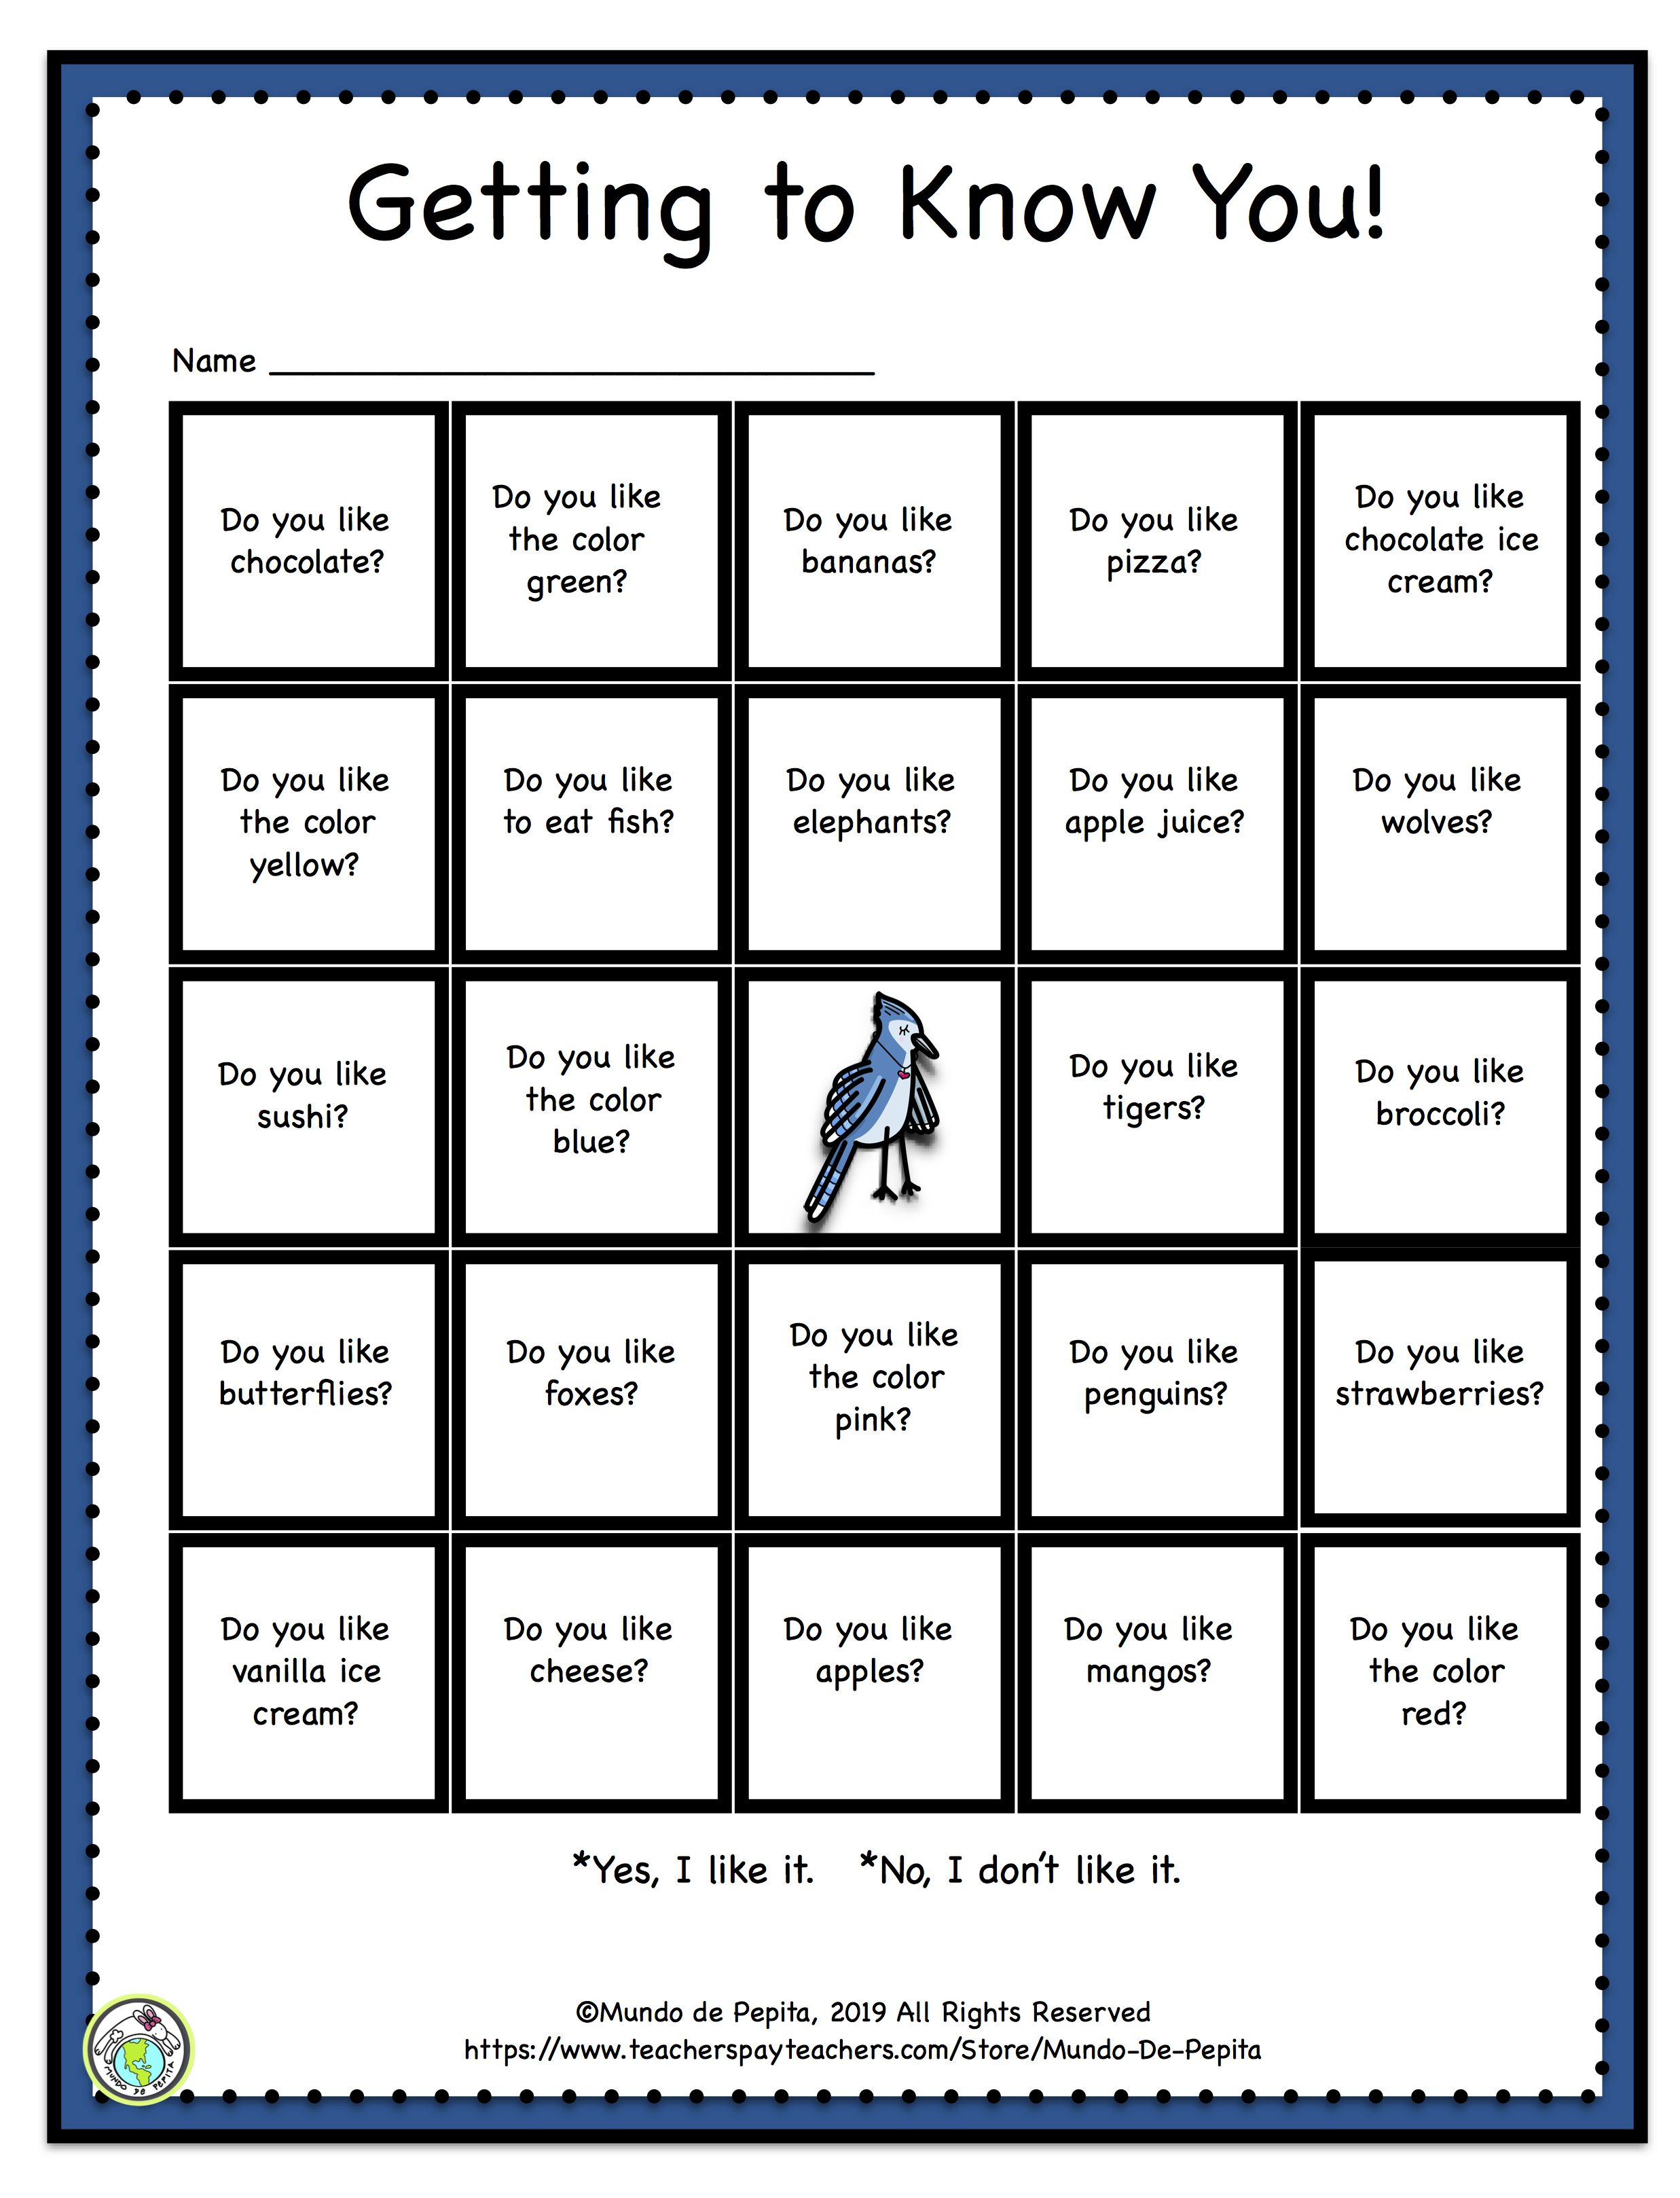 Free Getting To Know You Bingo In English In